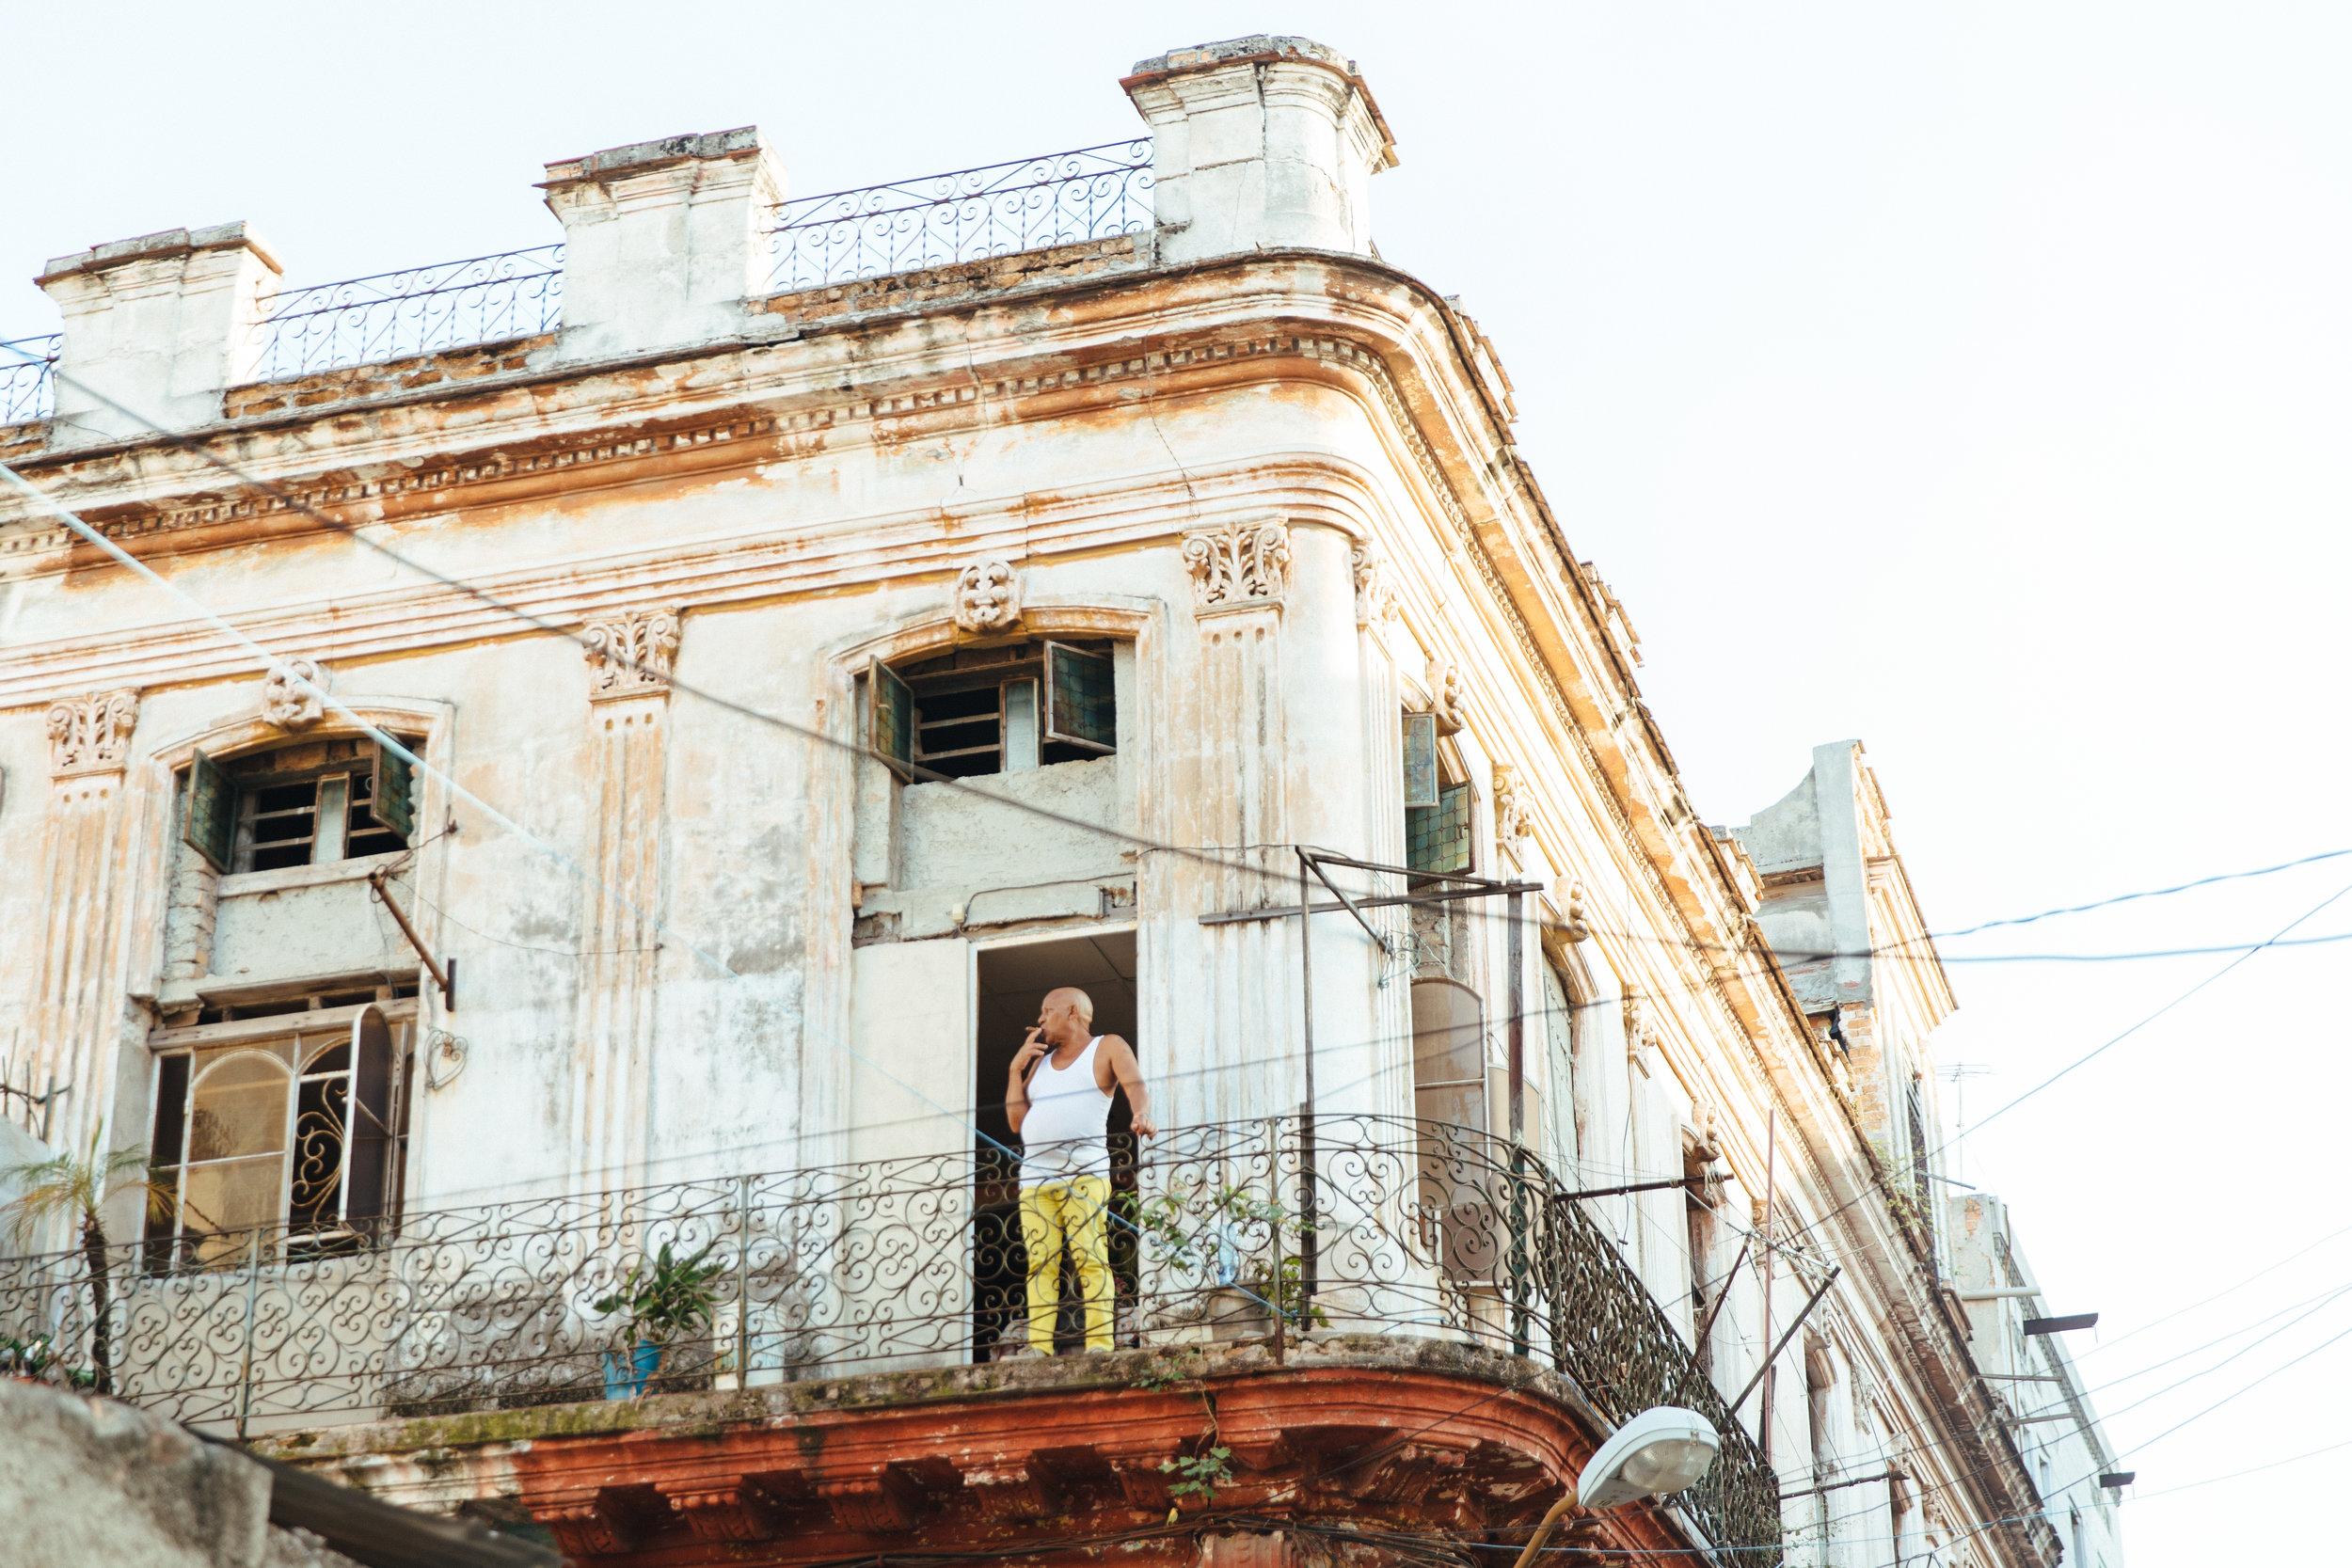 071217-Simone-Anne-Cuba-El-Camino-Travel-173 (1).jpg